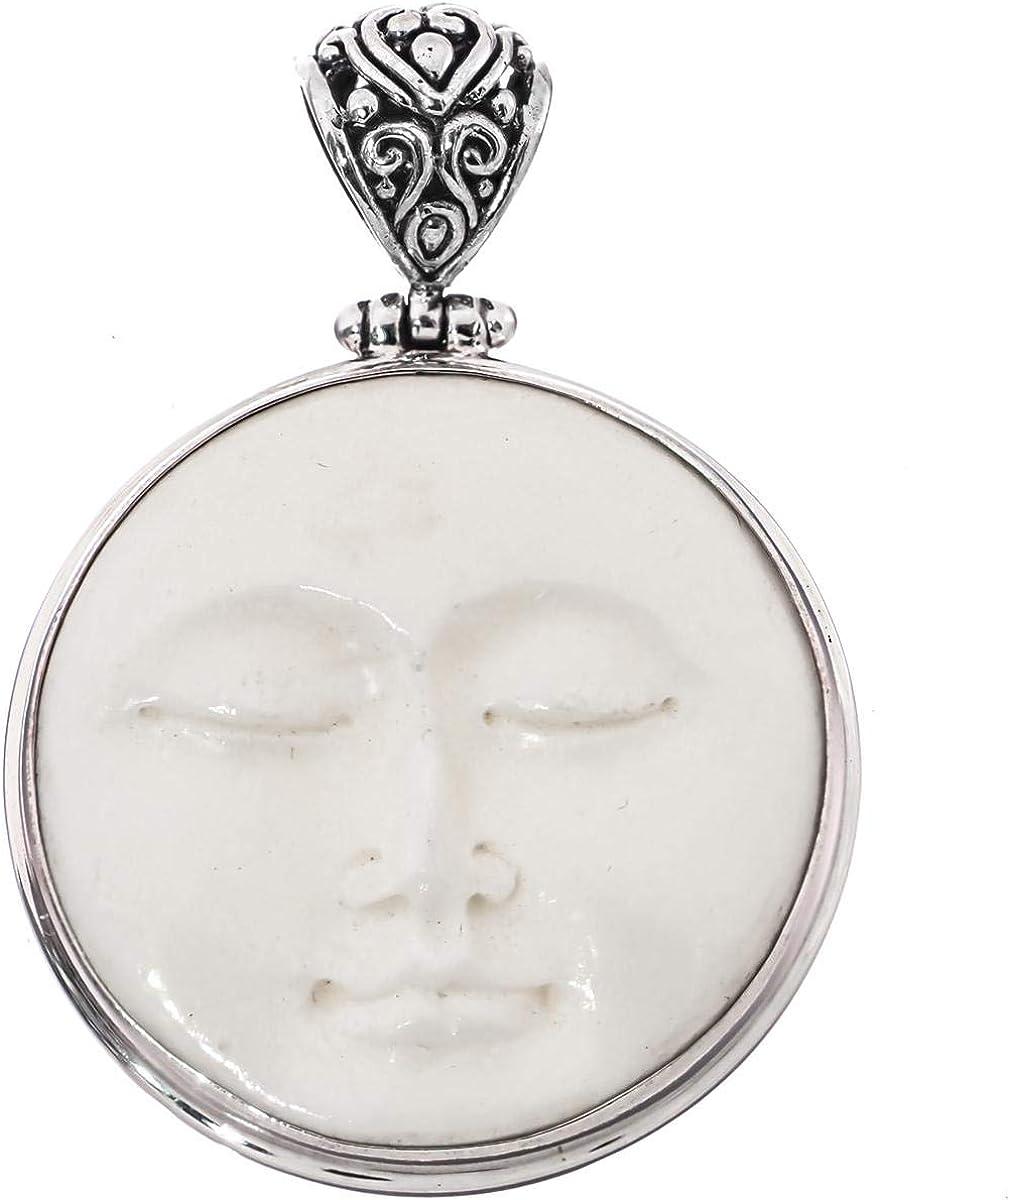 1 58 Inch Pendant Jewelry Pink Quartz Pearl Silver Pendant 925 Sterling Silver